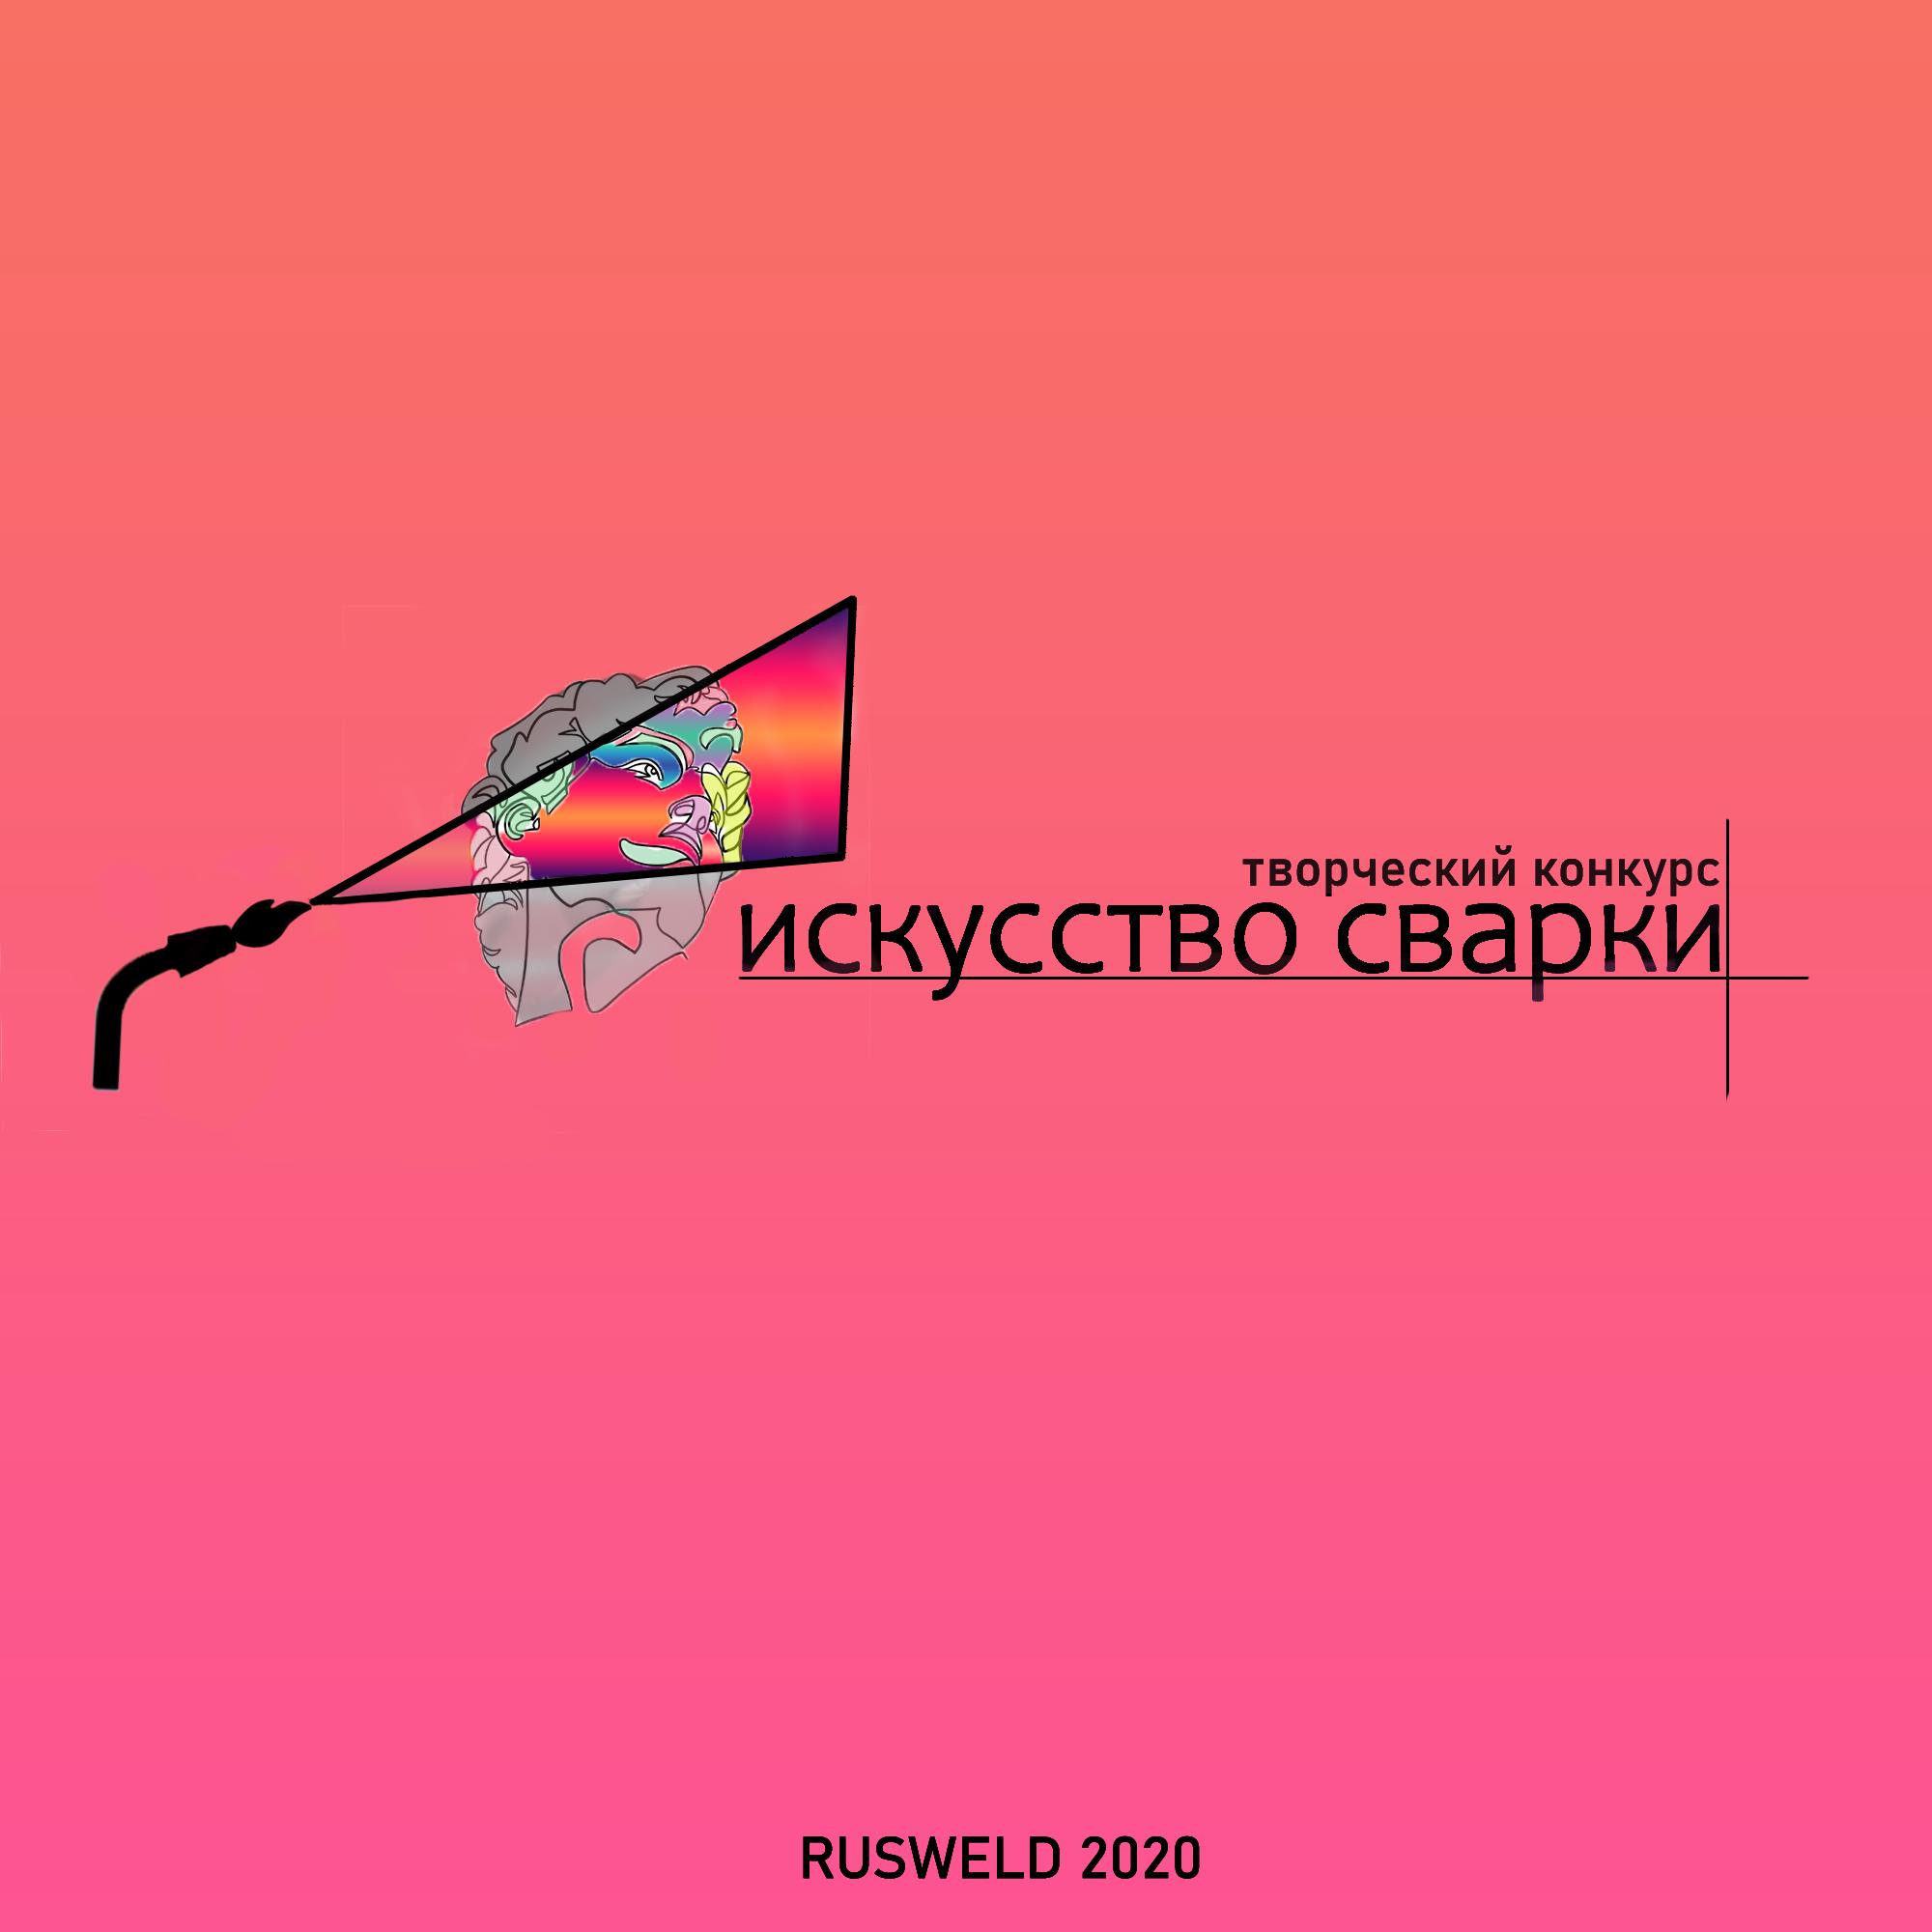 Разработка логотипа для Конкурса фото f_1505f70c426d3ee5.png